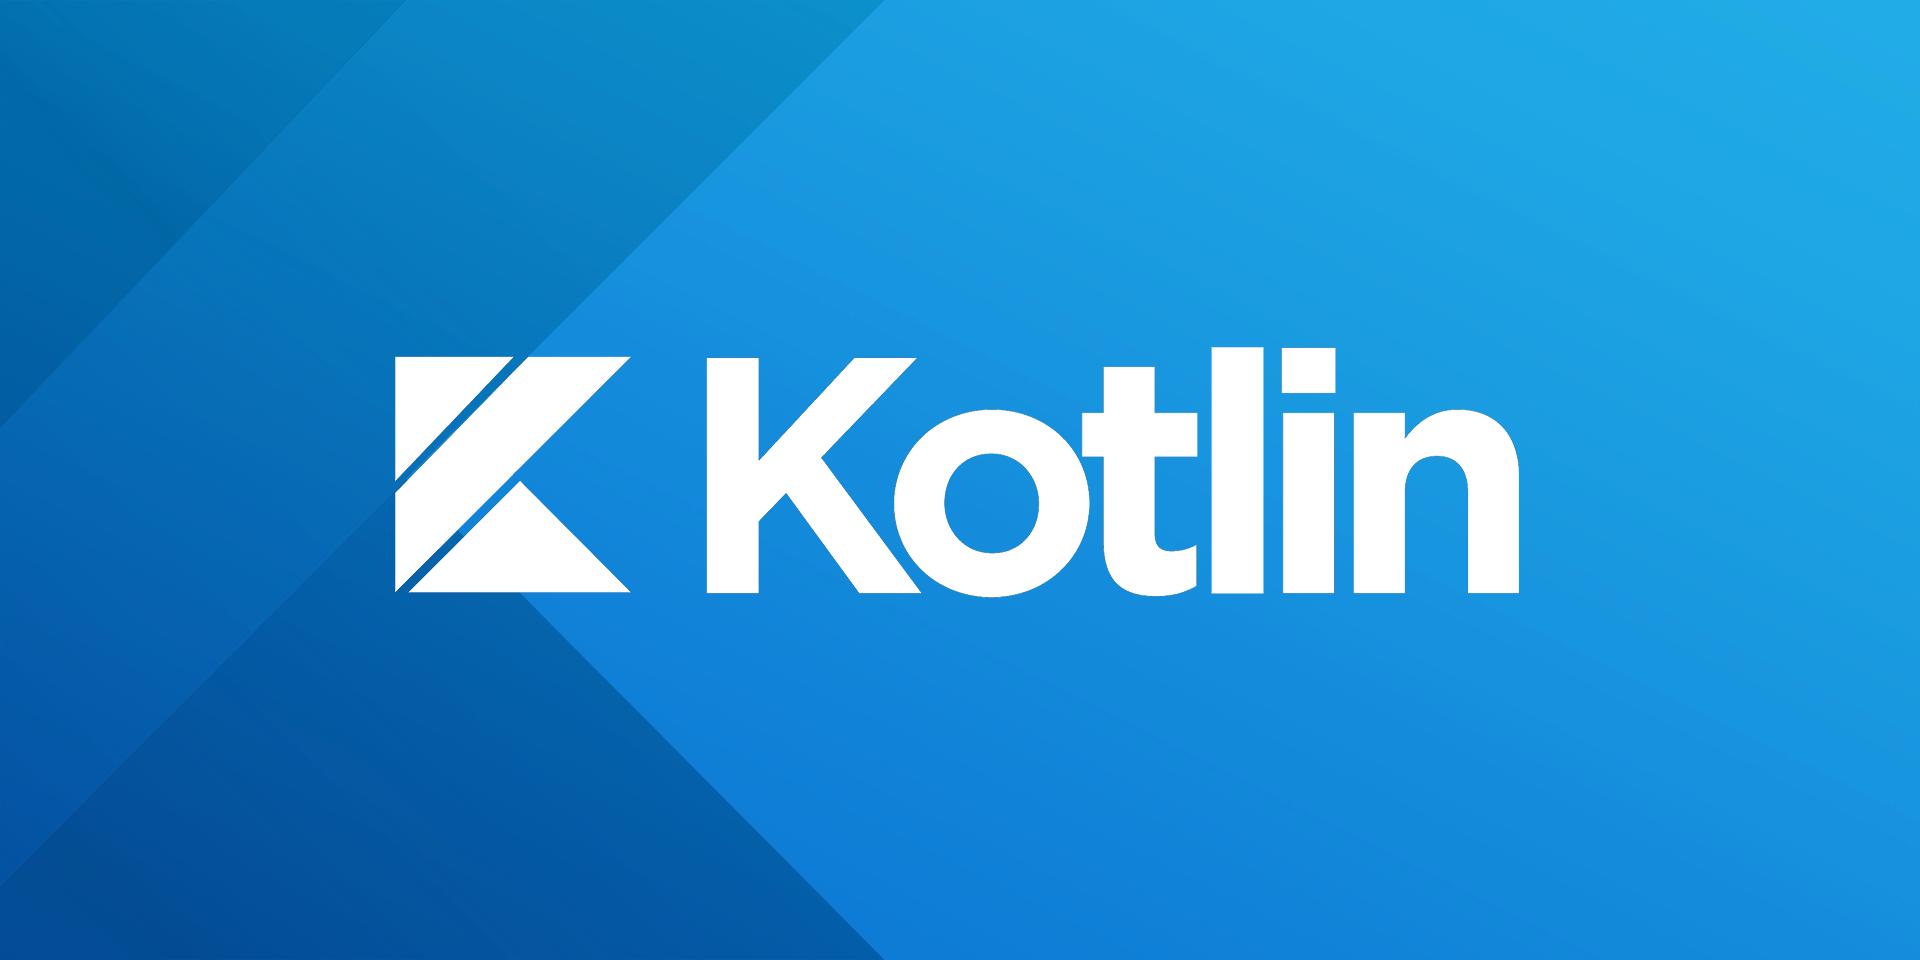 Kotlin A Language We Should Know Of Eman